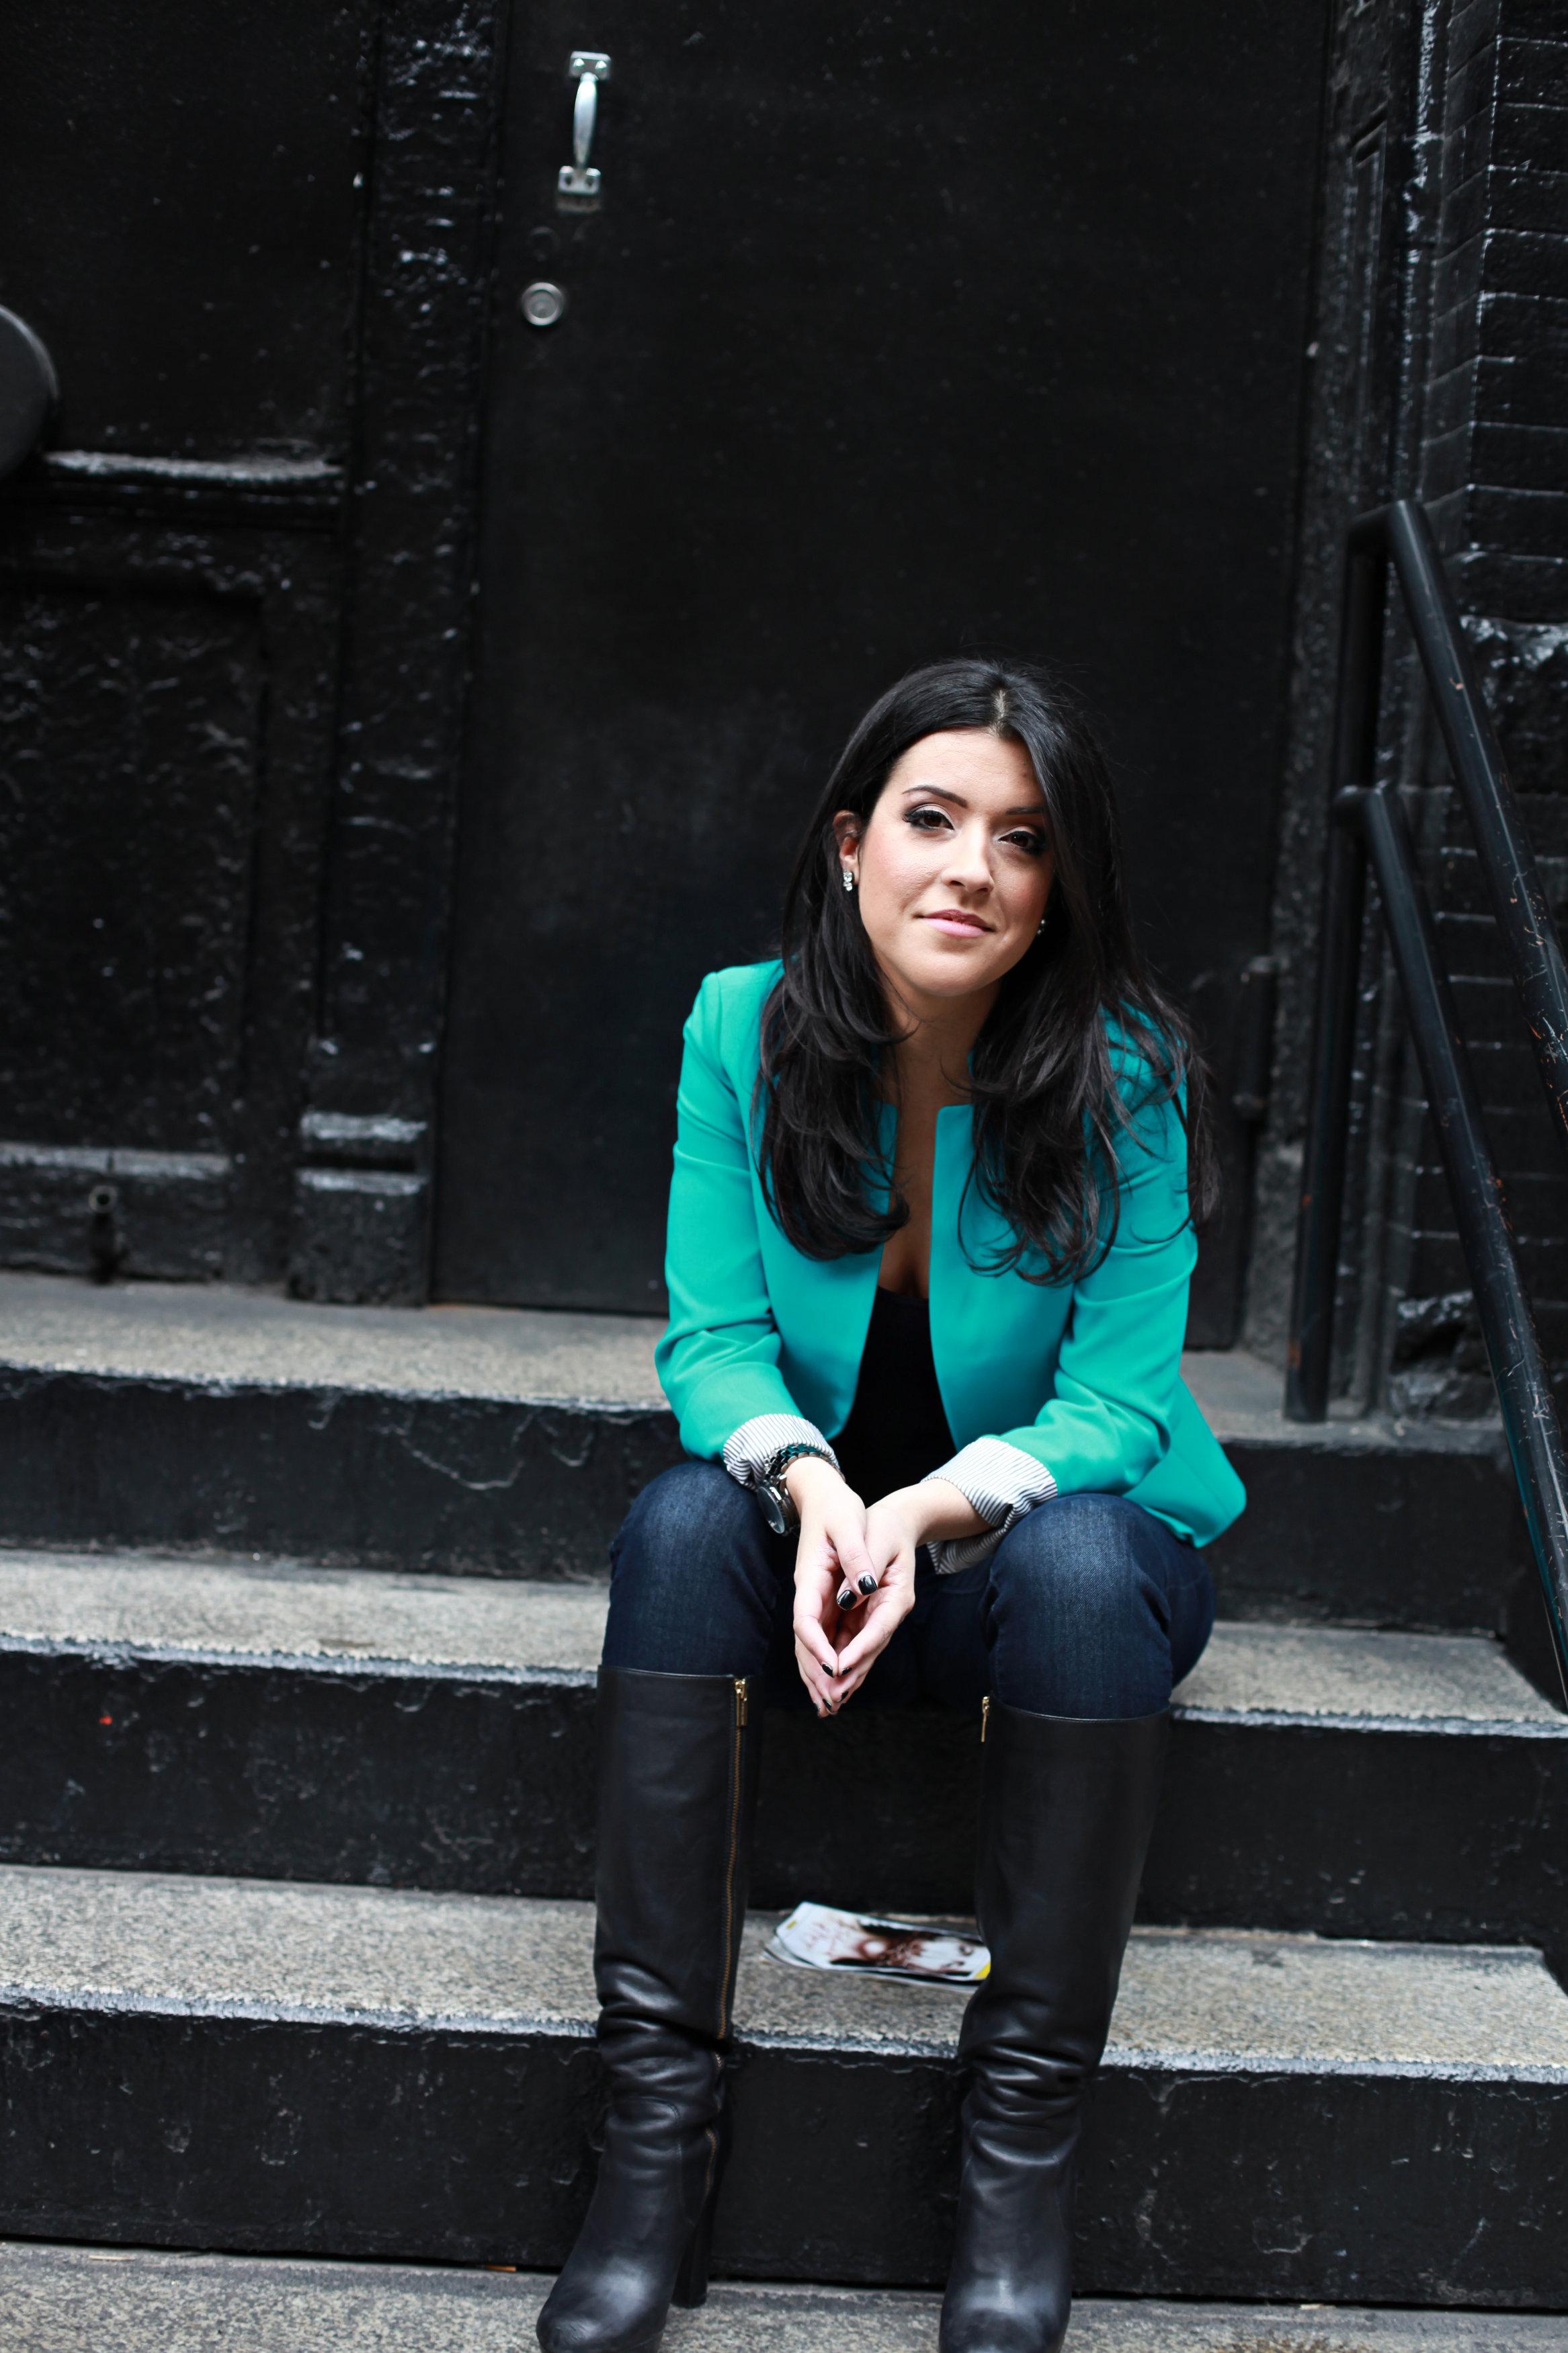 Megan Minutillo (photography by Tiffany Farley)